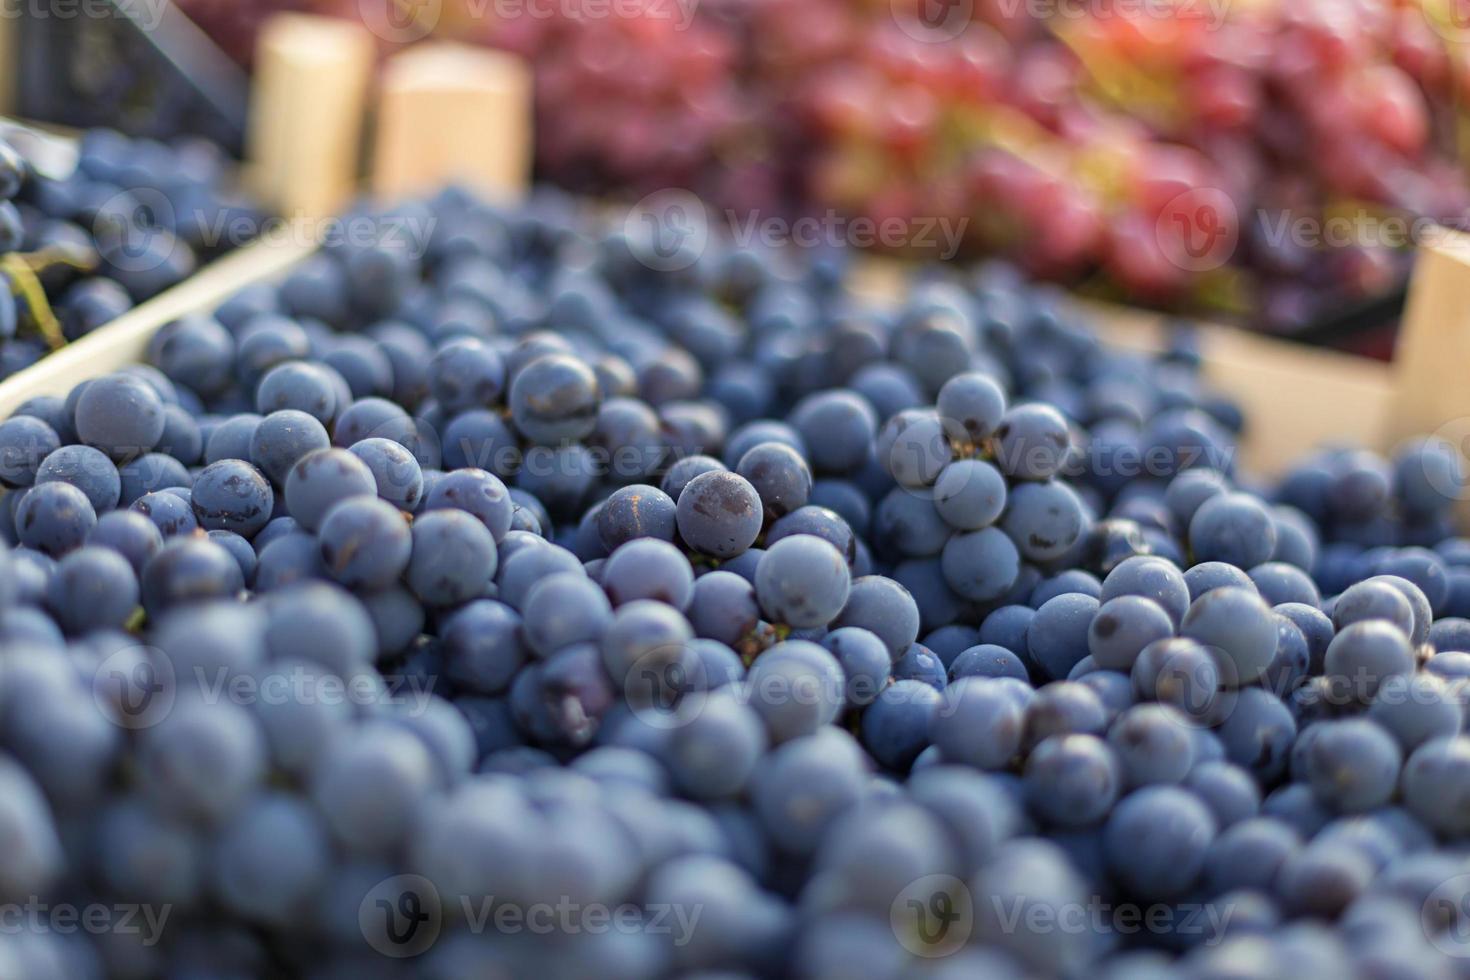 druiven op de markt foto